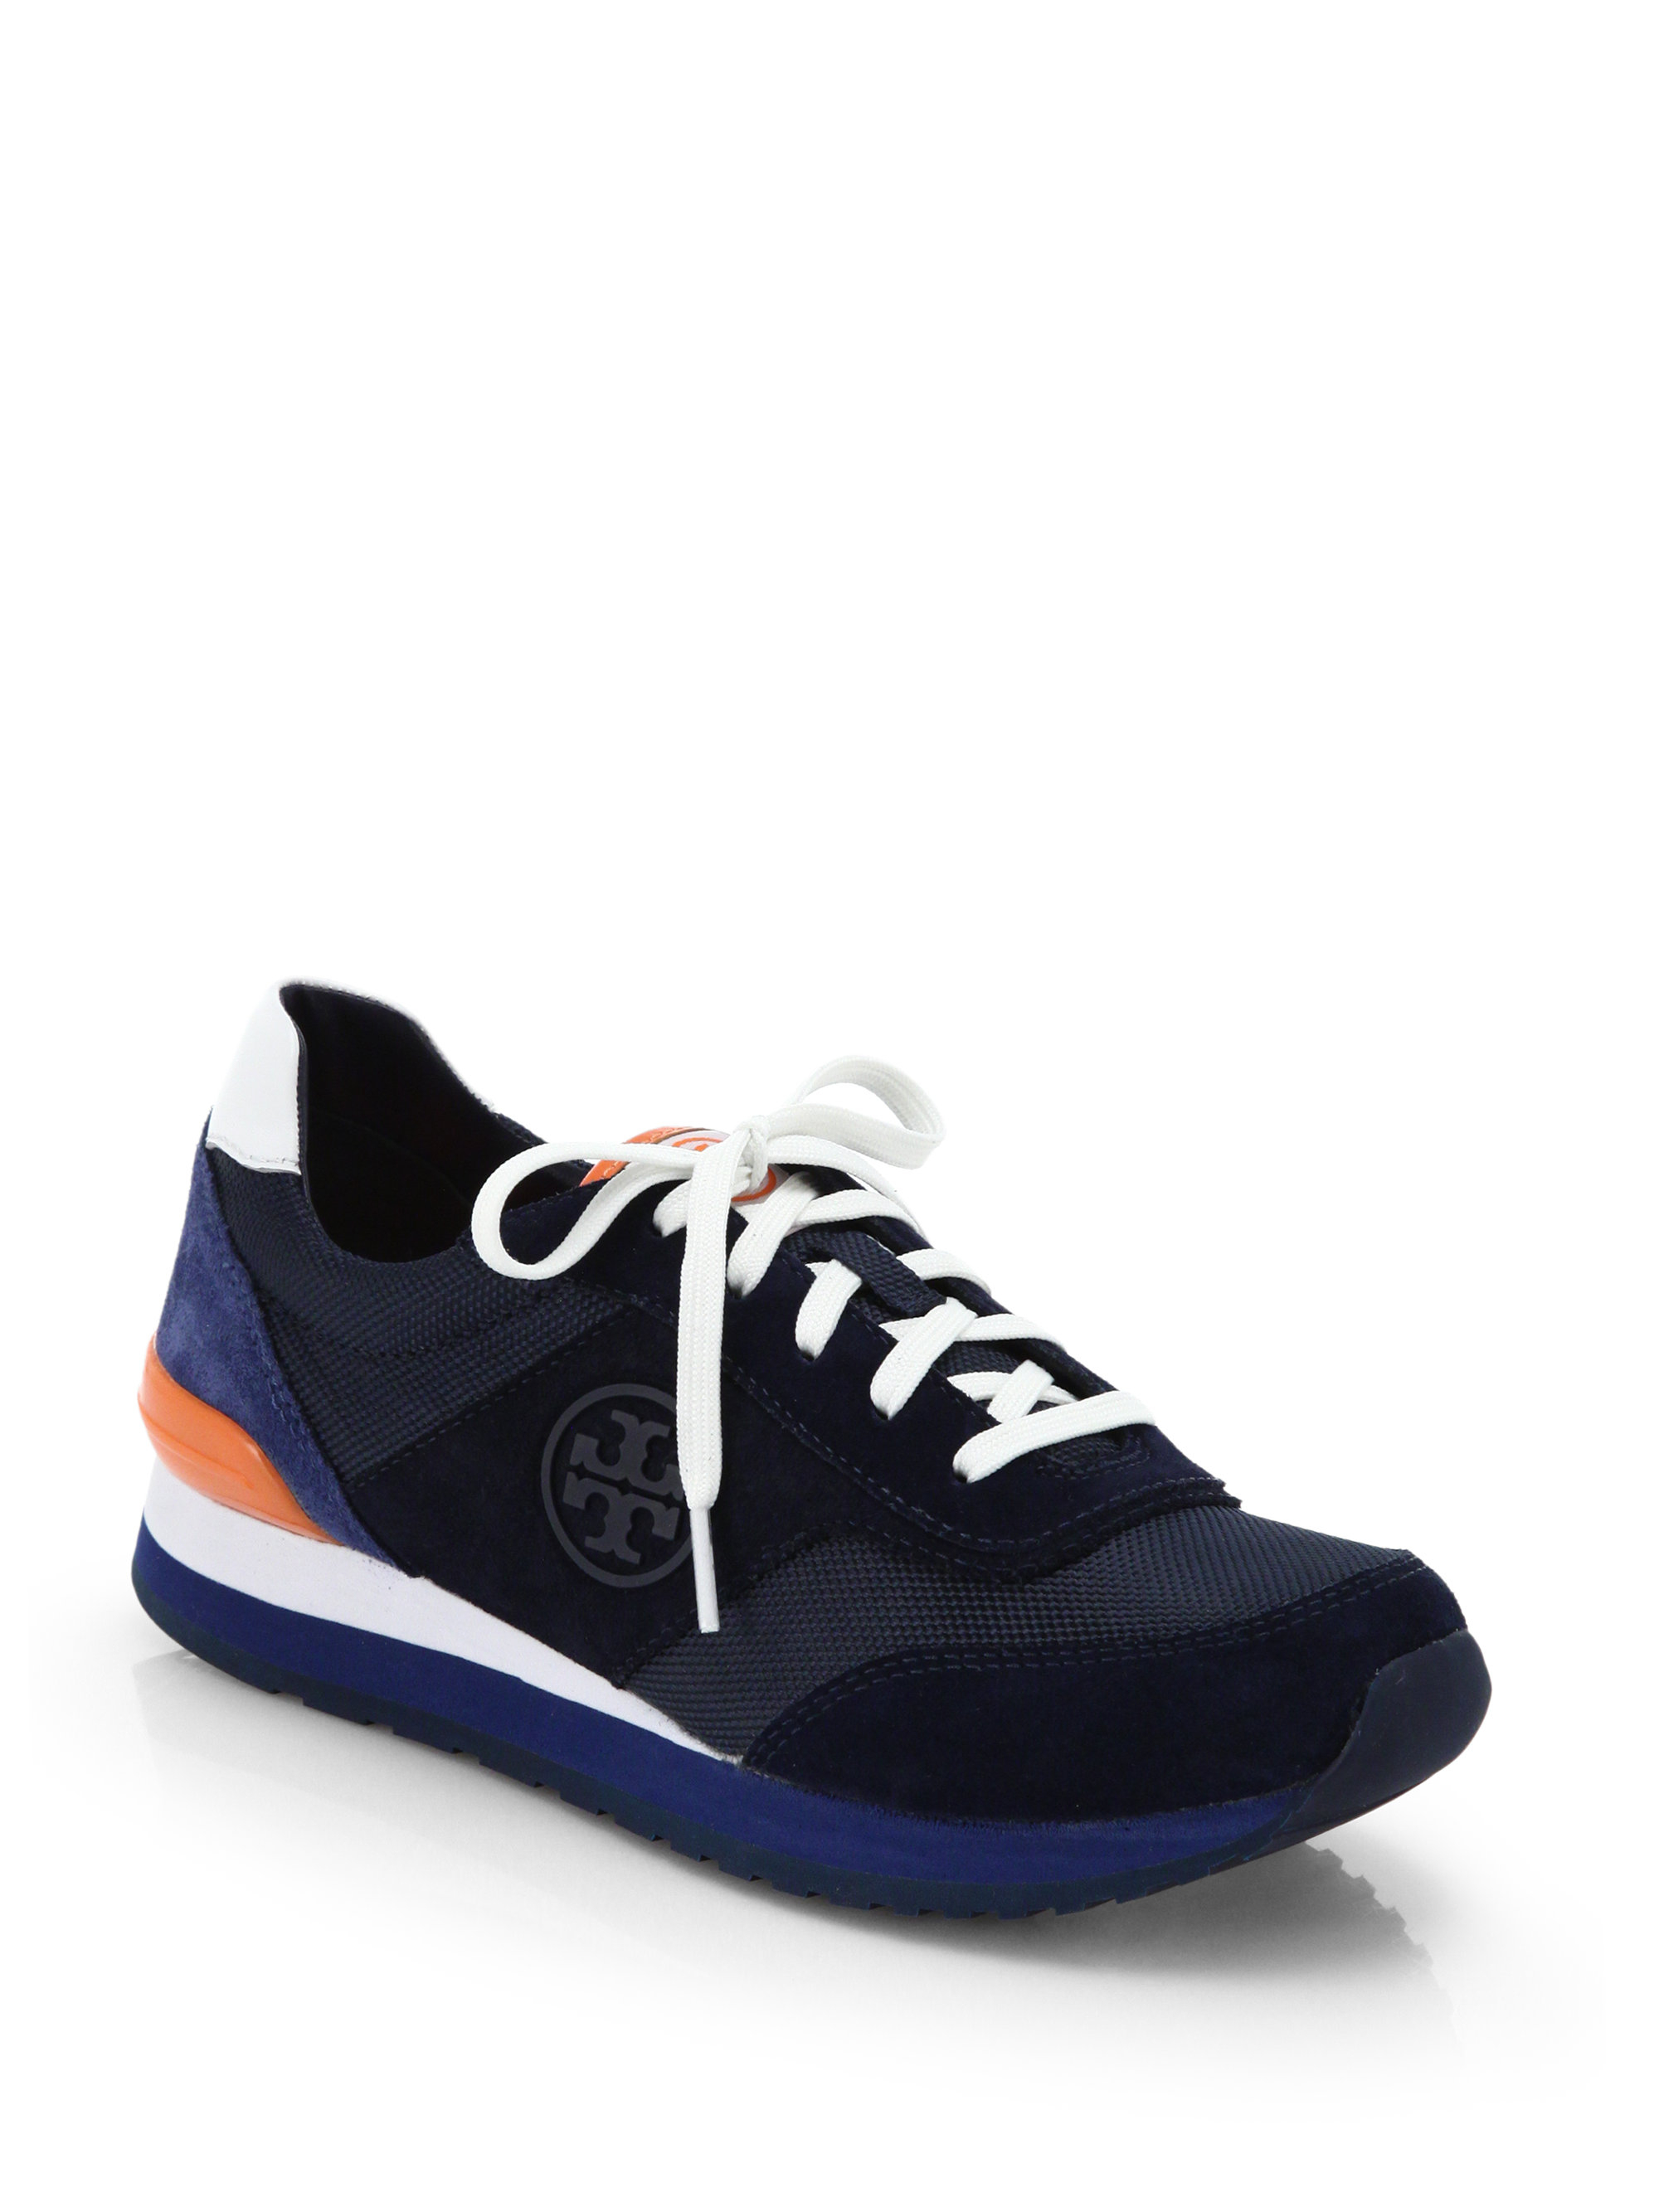 cda973f1e319 Lyst - Tory Burch Colorblock Suede   Fabric Sneakers in Blue